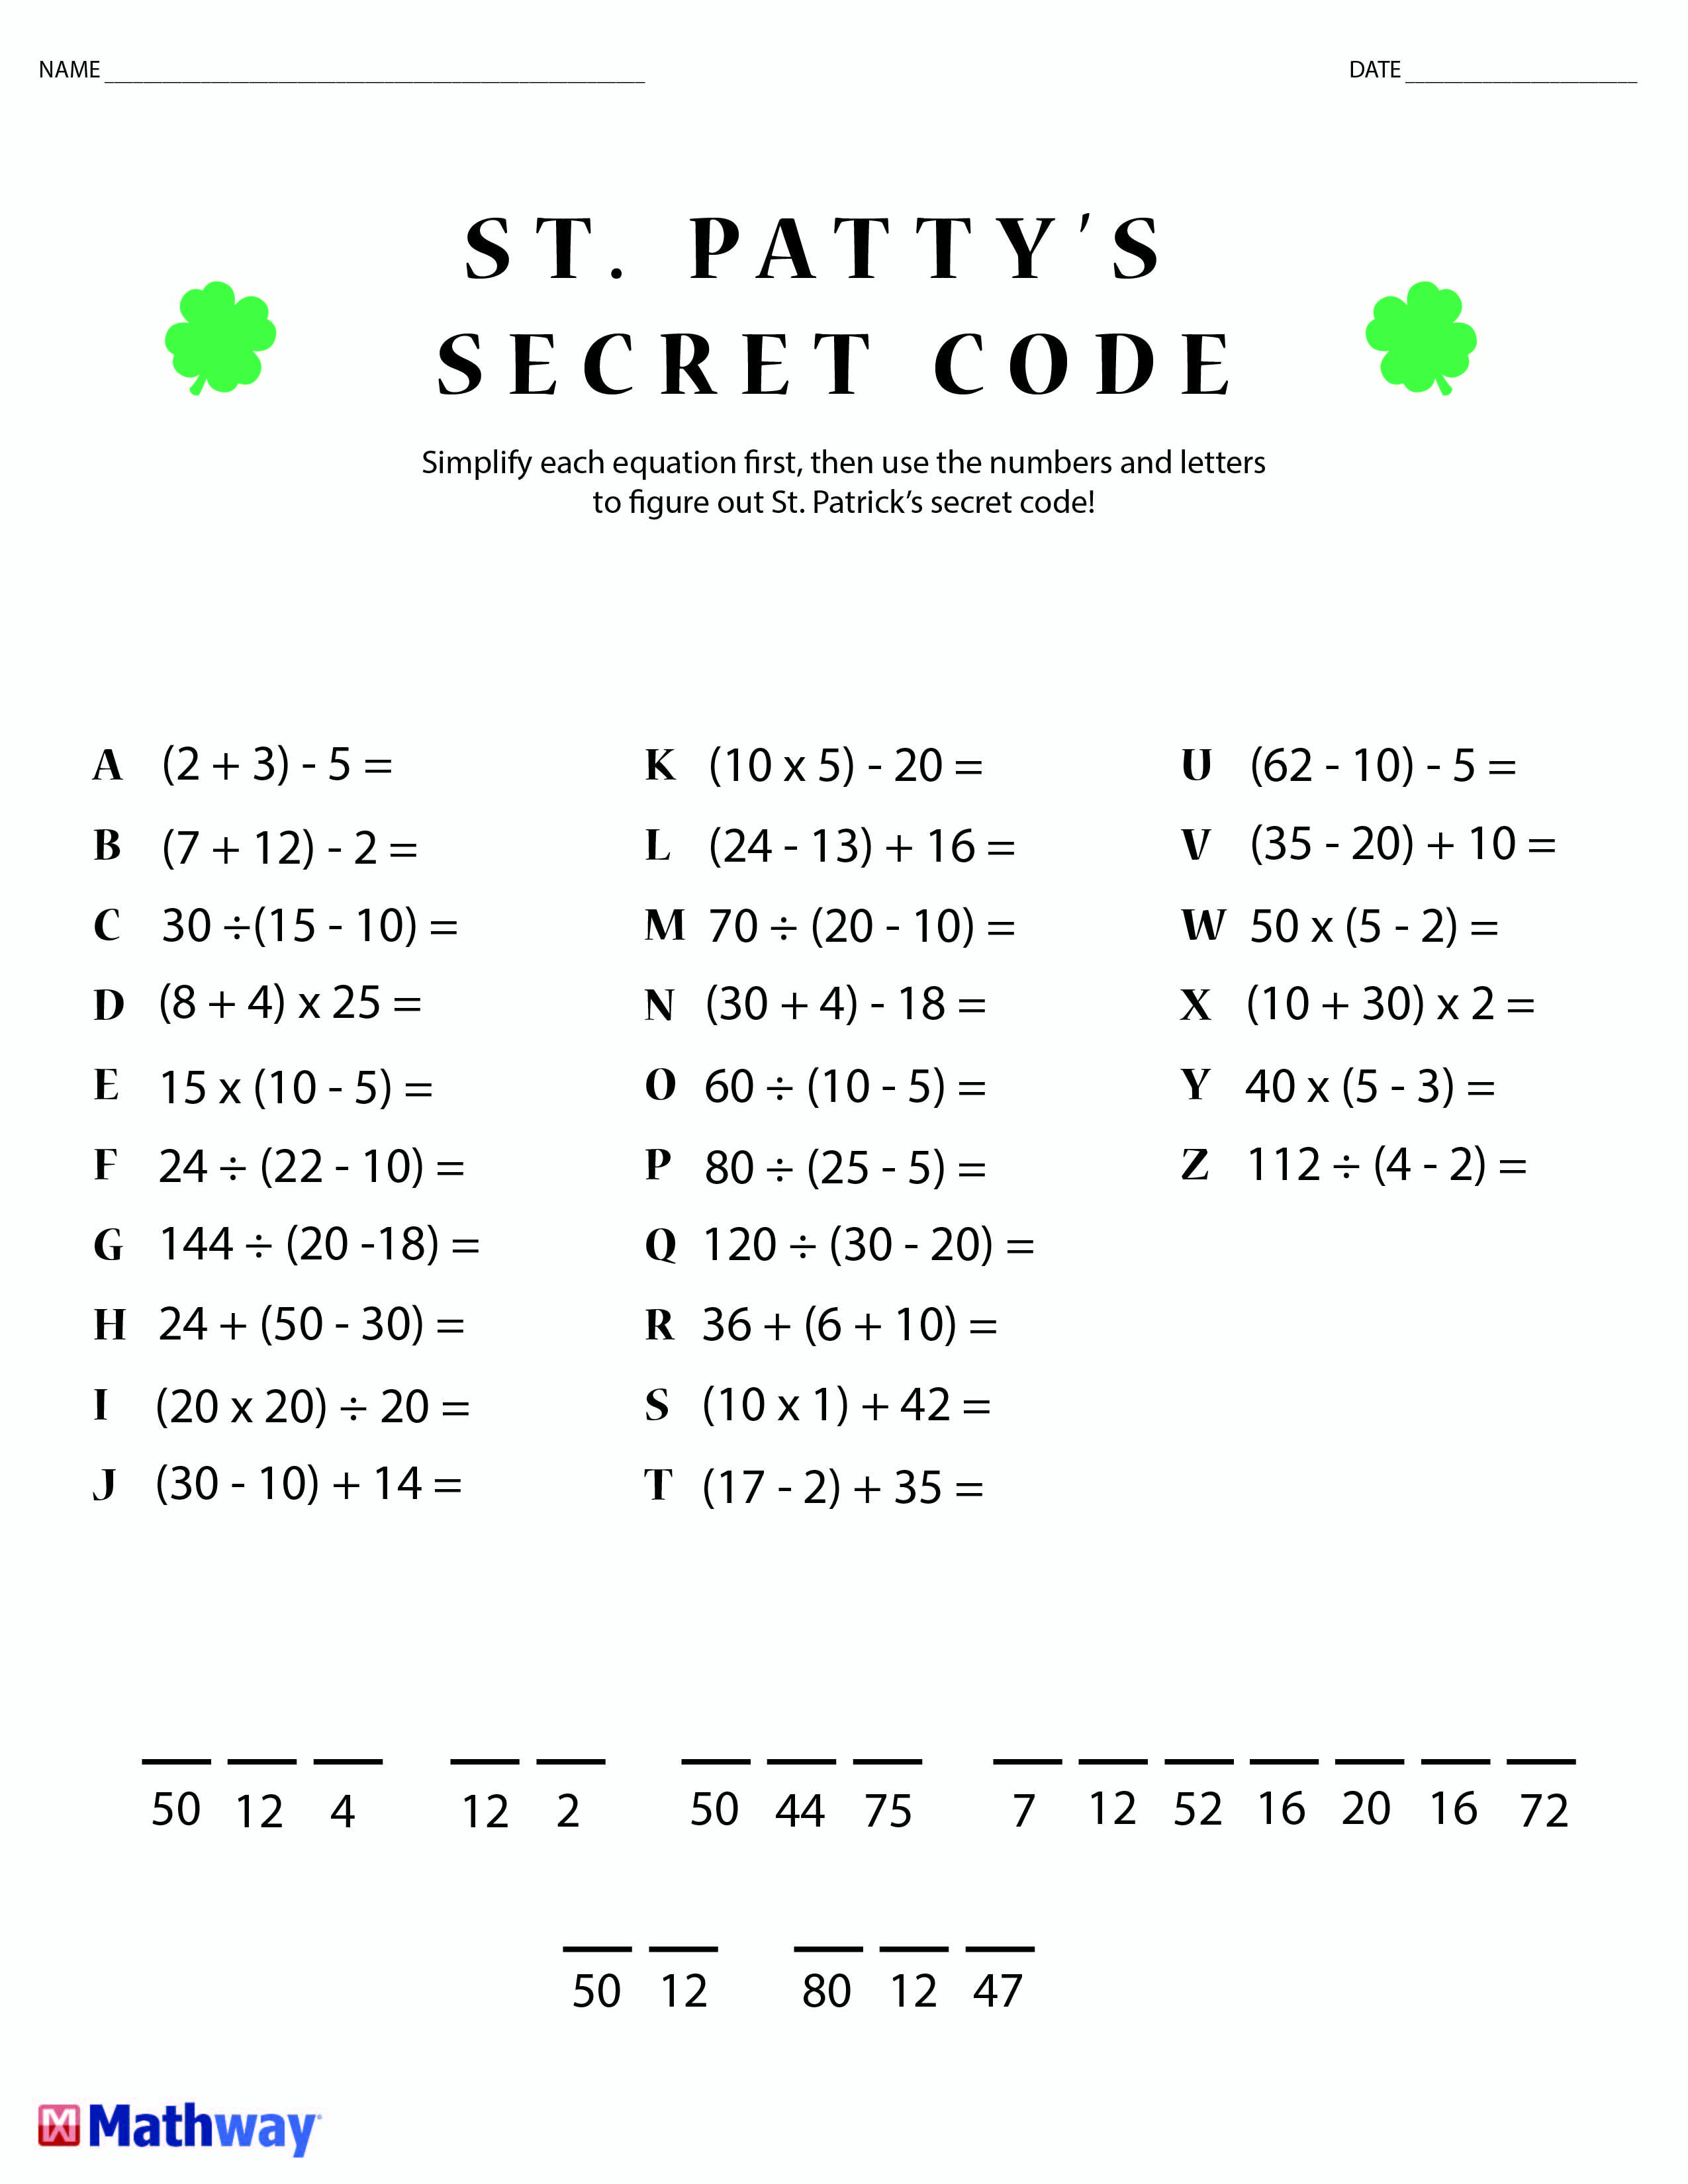 St. Patty's Day Crack The Secret Code Worksheet! Print This One Out | Crack The Code Worksheets Printable